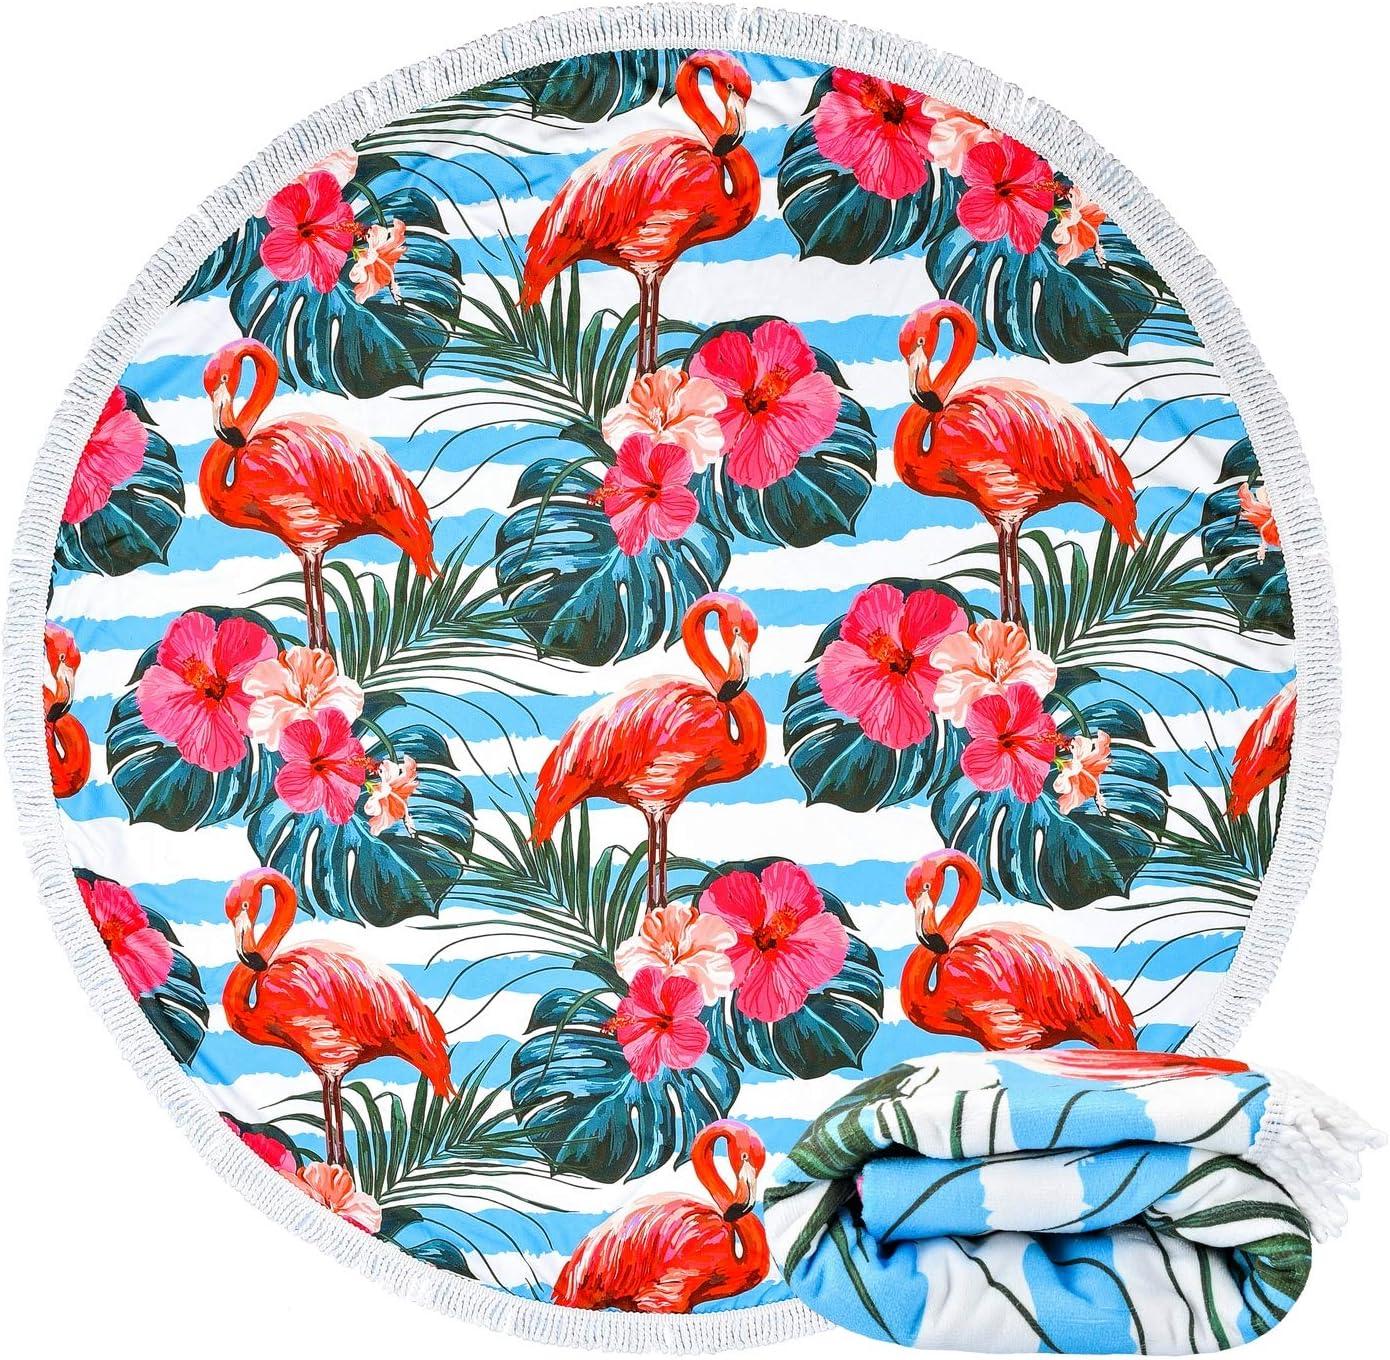 Hawaii Tropical Leaves Floral Yoga Mat 59 Microfiber Round Beach Blanket Sand Proof Oversized with Fringe Tassels Bonsai Tree Flamingo Round Beach Towel